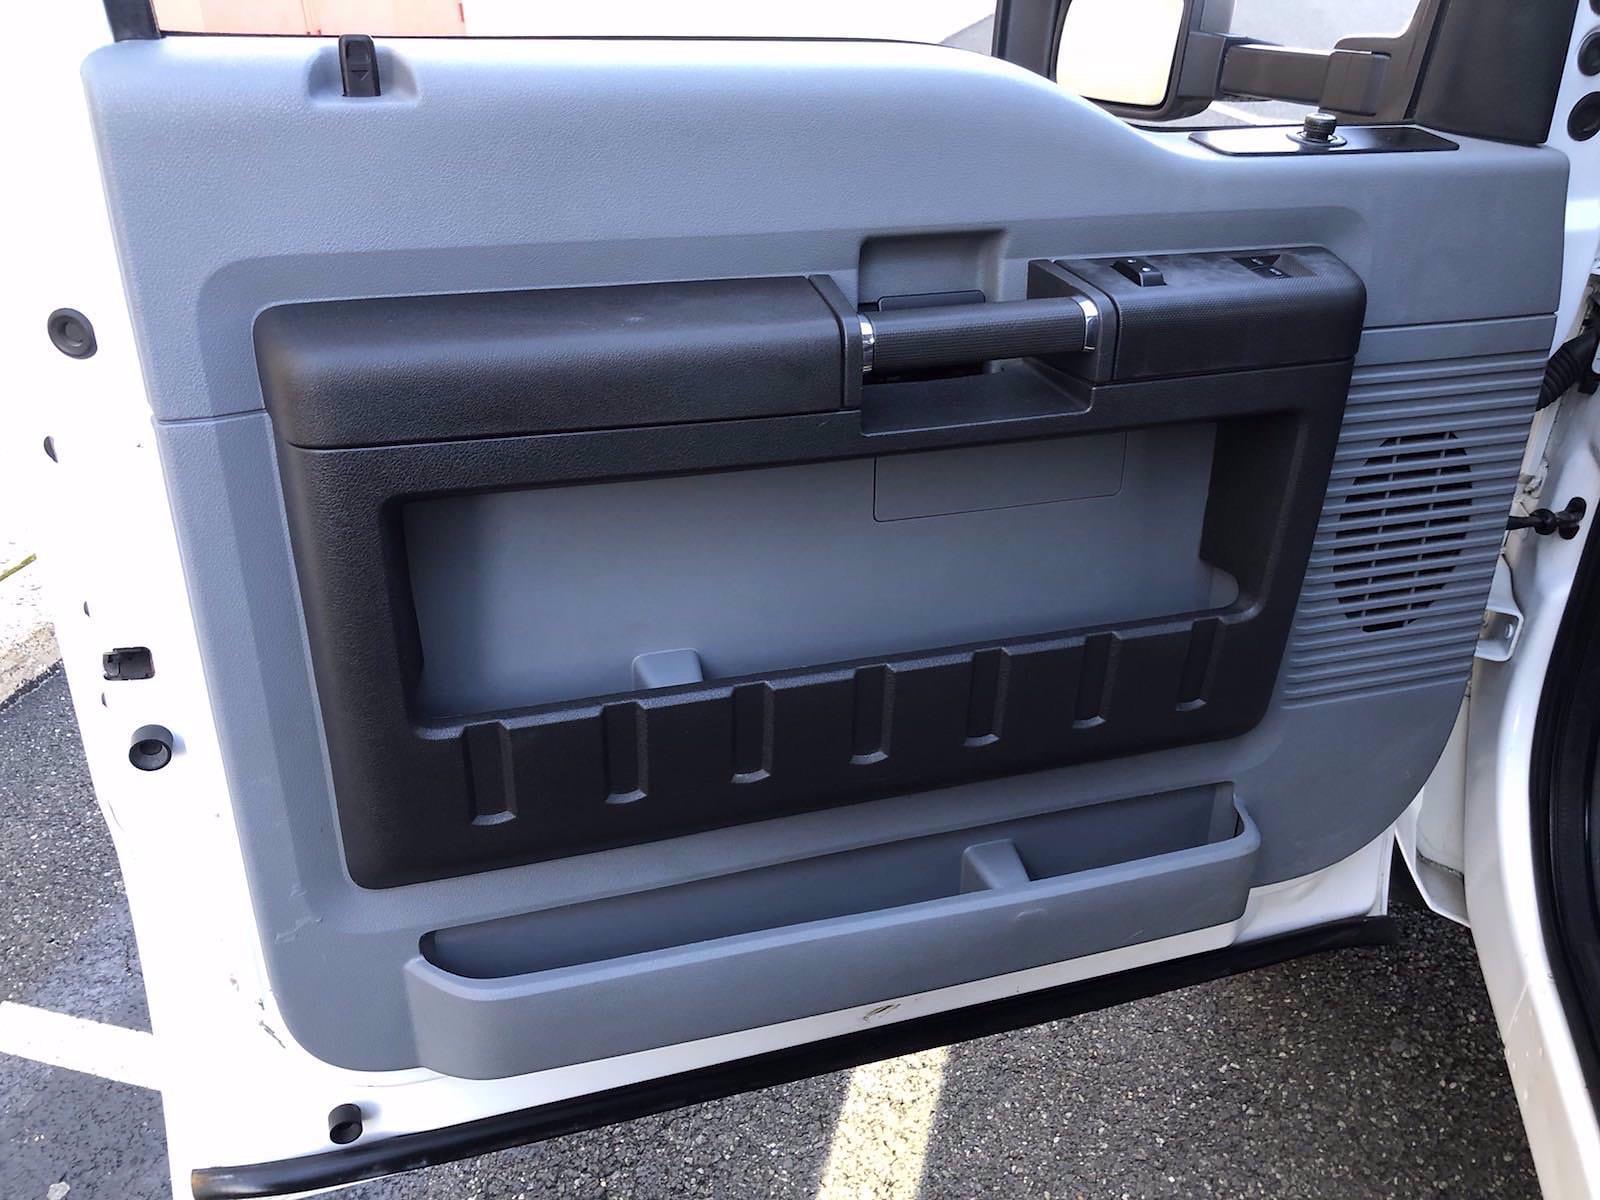 2016 Ford F-550 Regular Cab DRW 4x4, Dump Body #FL1098J - photo 14